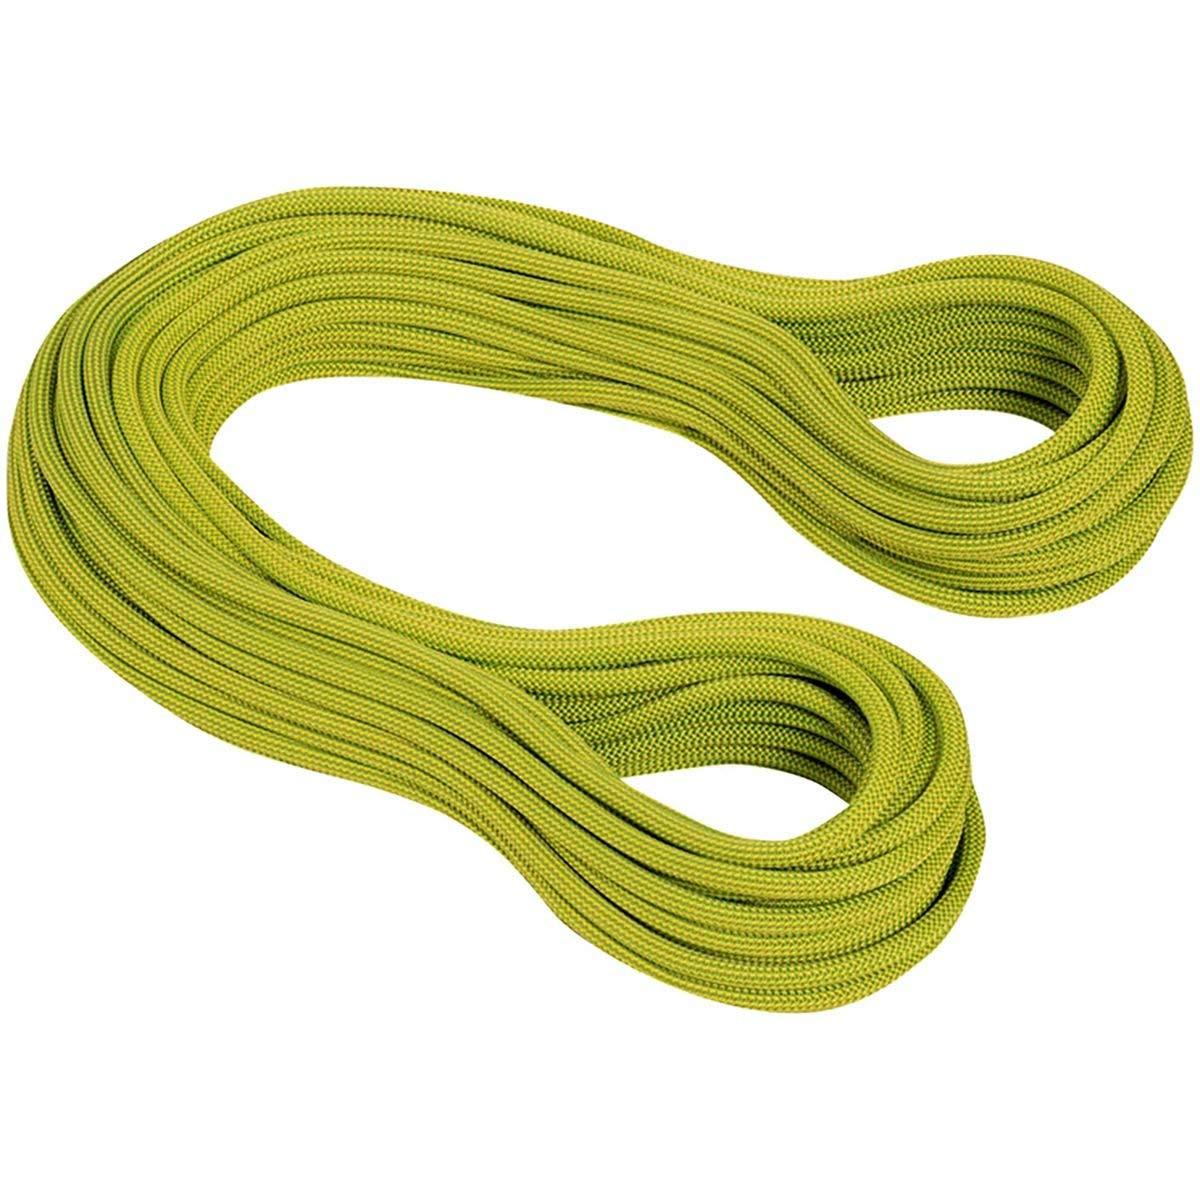 Mammut 9 5 Mm Infinity Dry Dynamic Rope